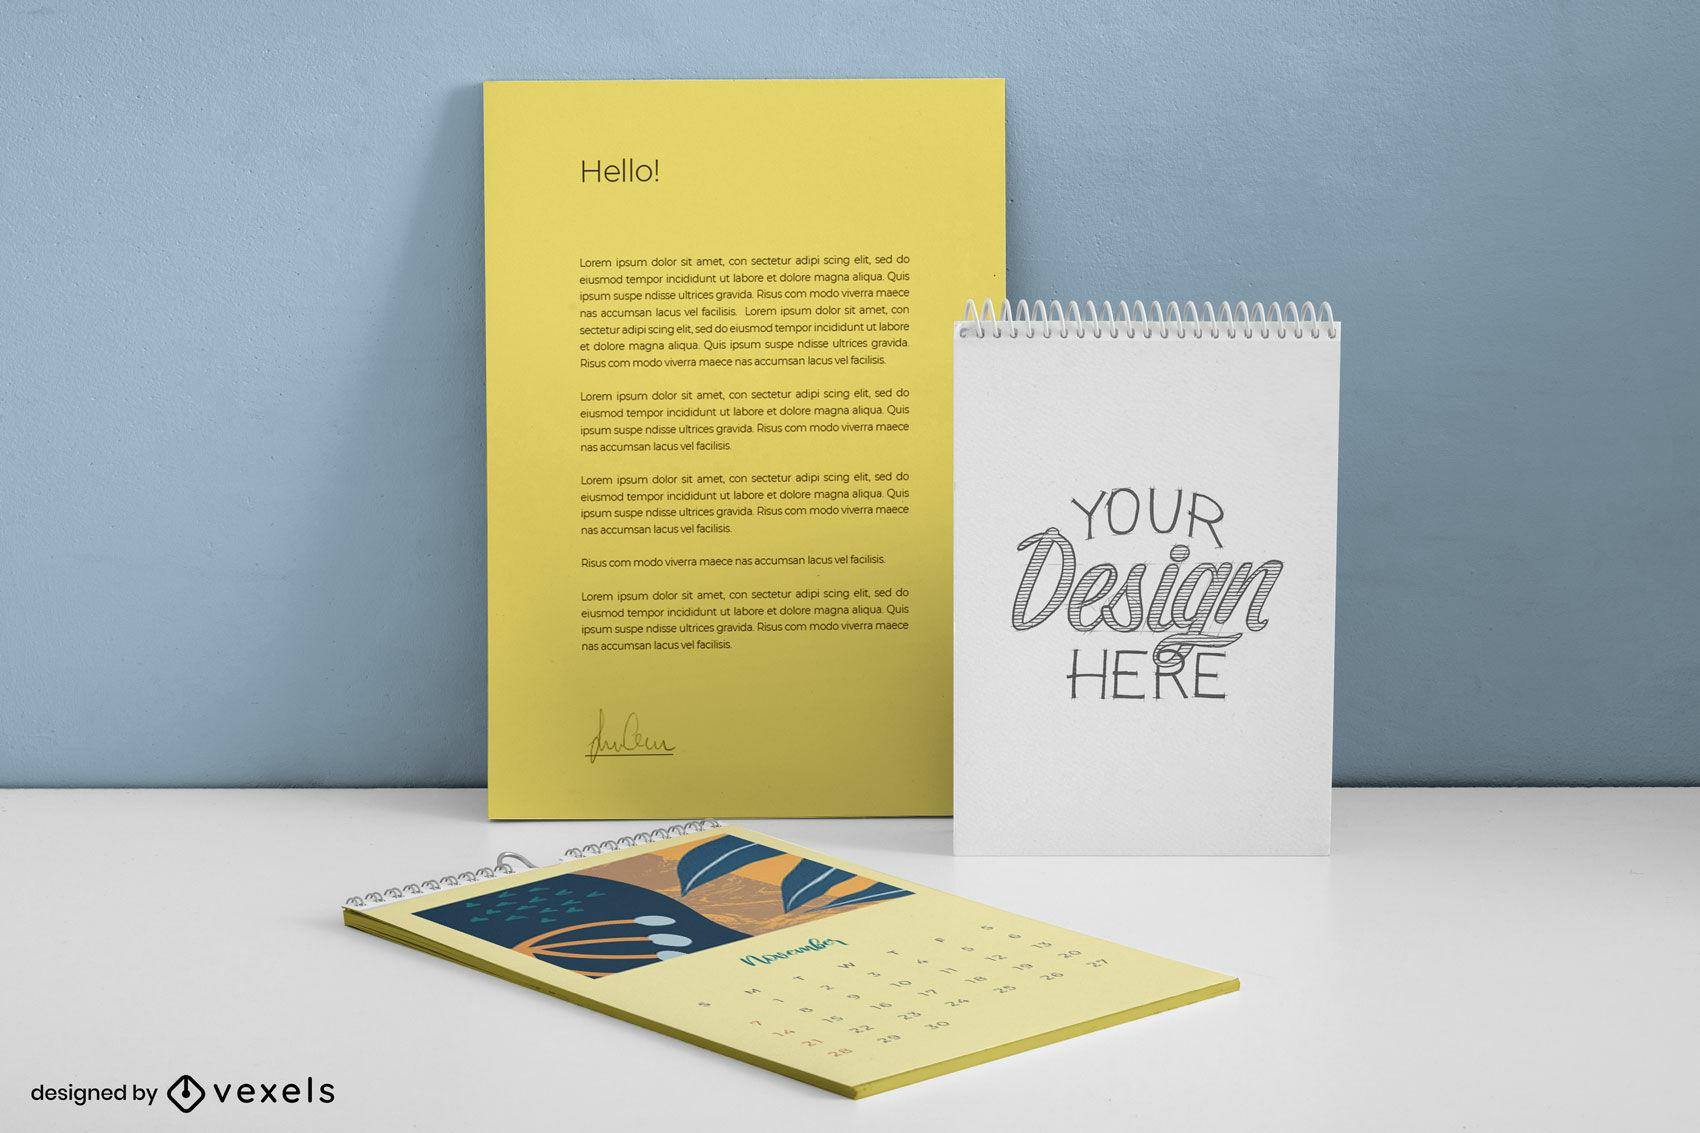 Maqueta de kit de marca amarilla estacionaria